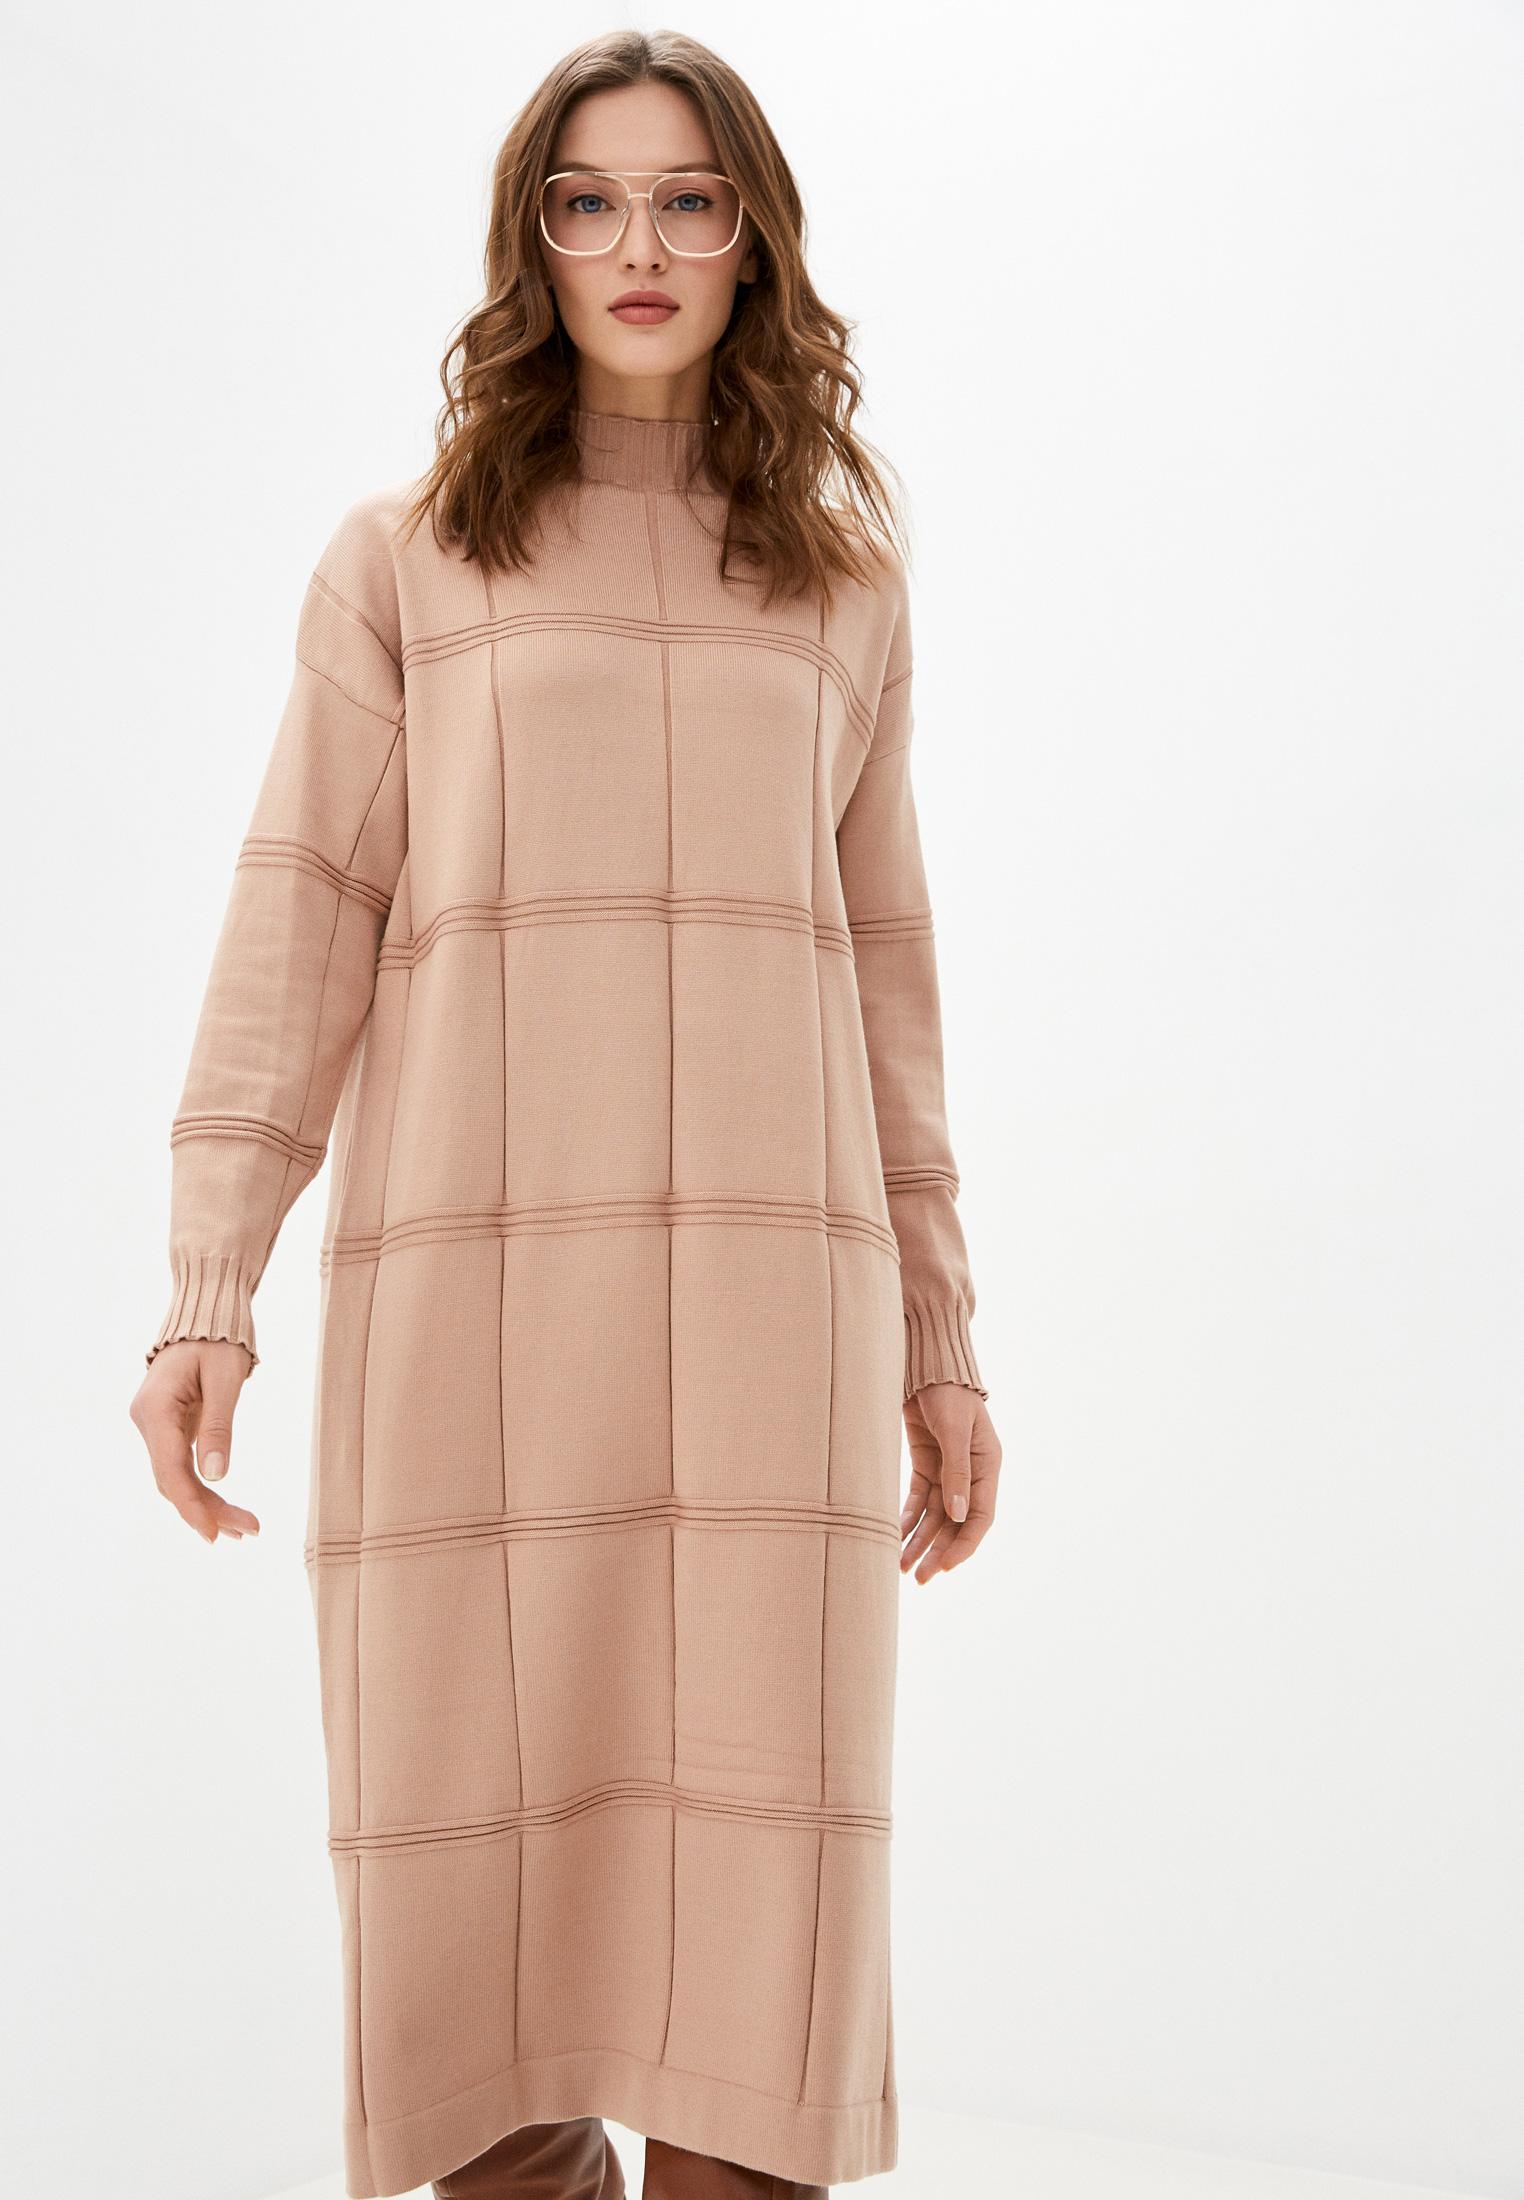 Вязаное платье Vickwool WV259-2